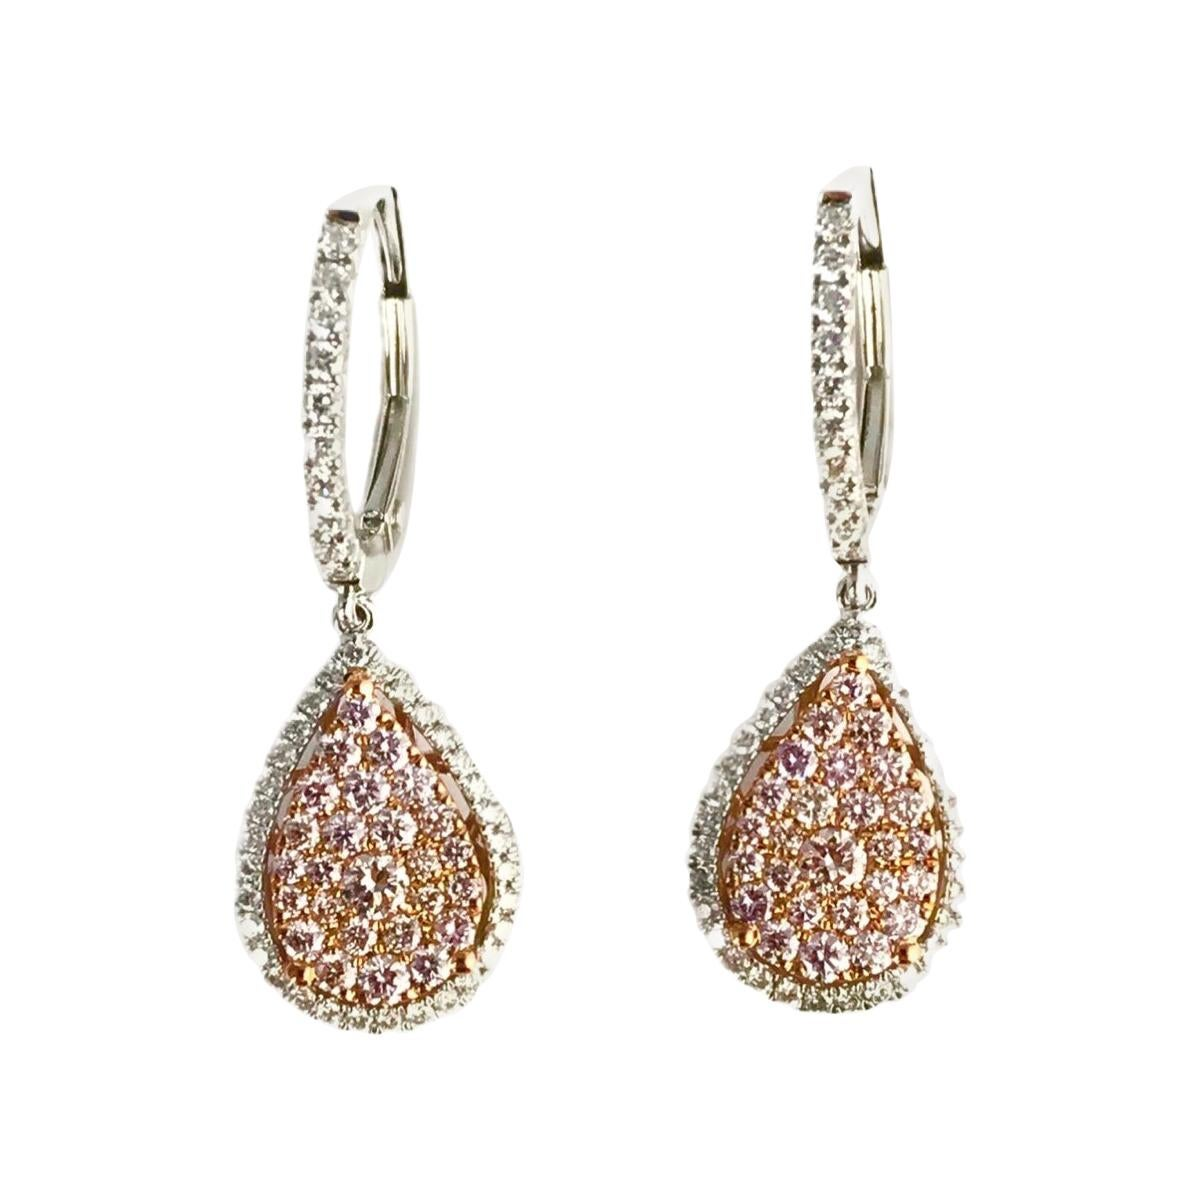 DiamondTown 0.95 Carat Natural Pink Diamond Lever-Back Diamond Earrings in 18k